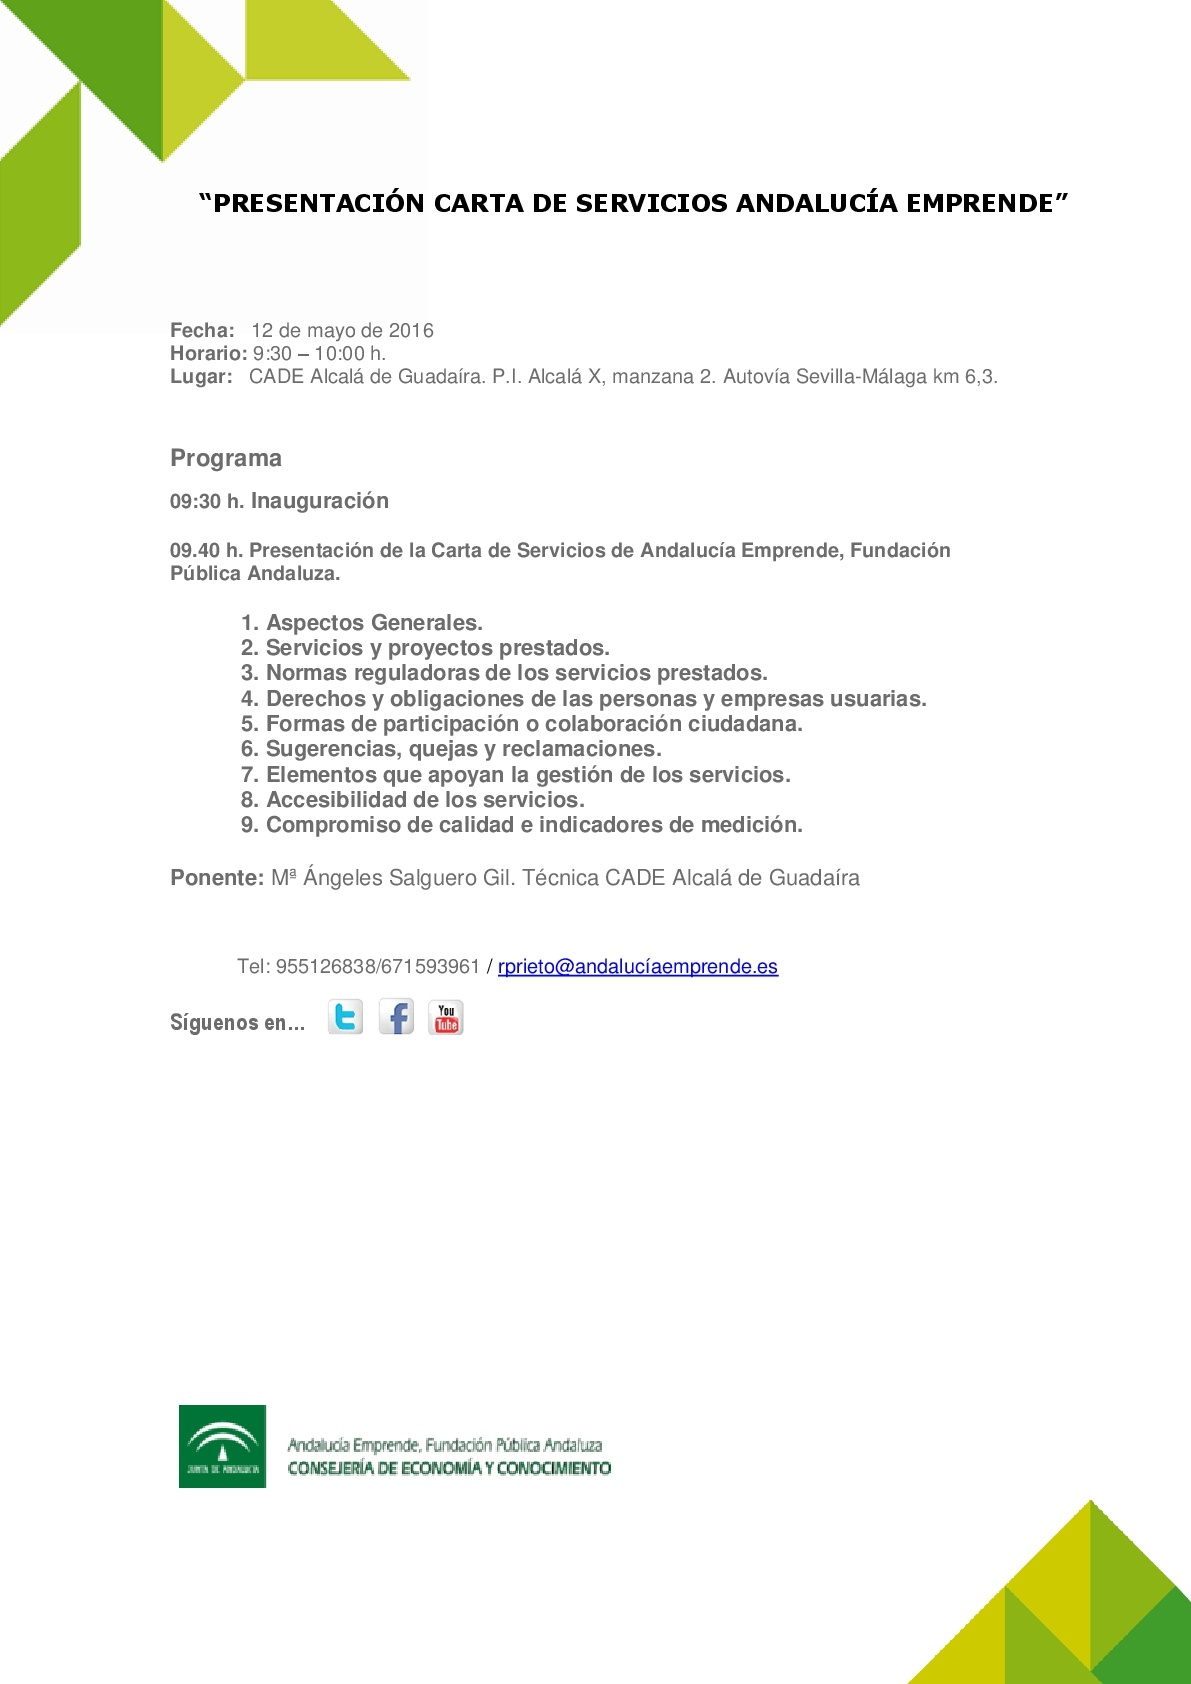 presentaci u00f3n carta de servicios andaluc u00eda emprende